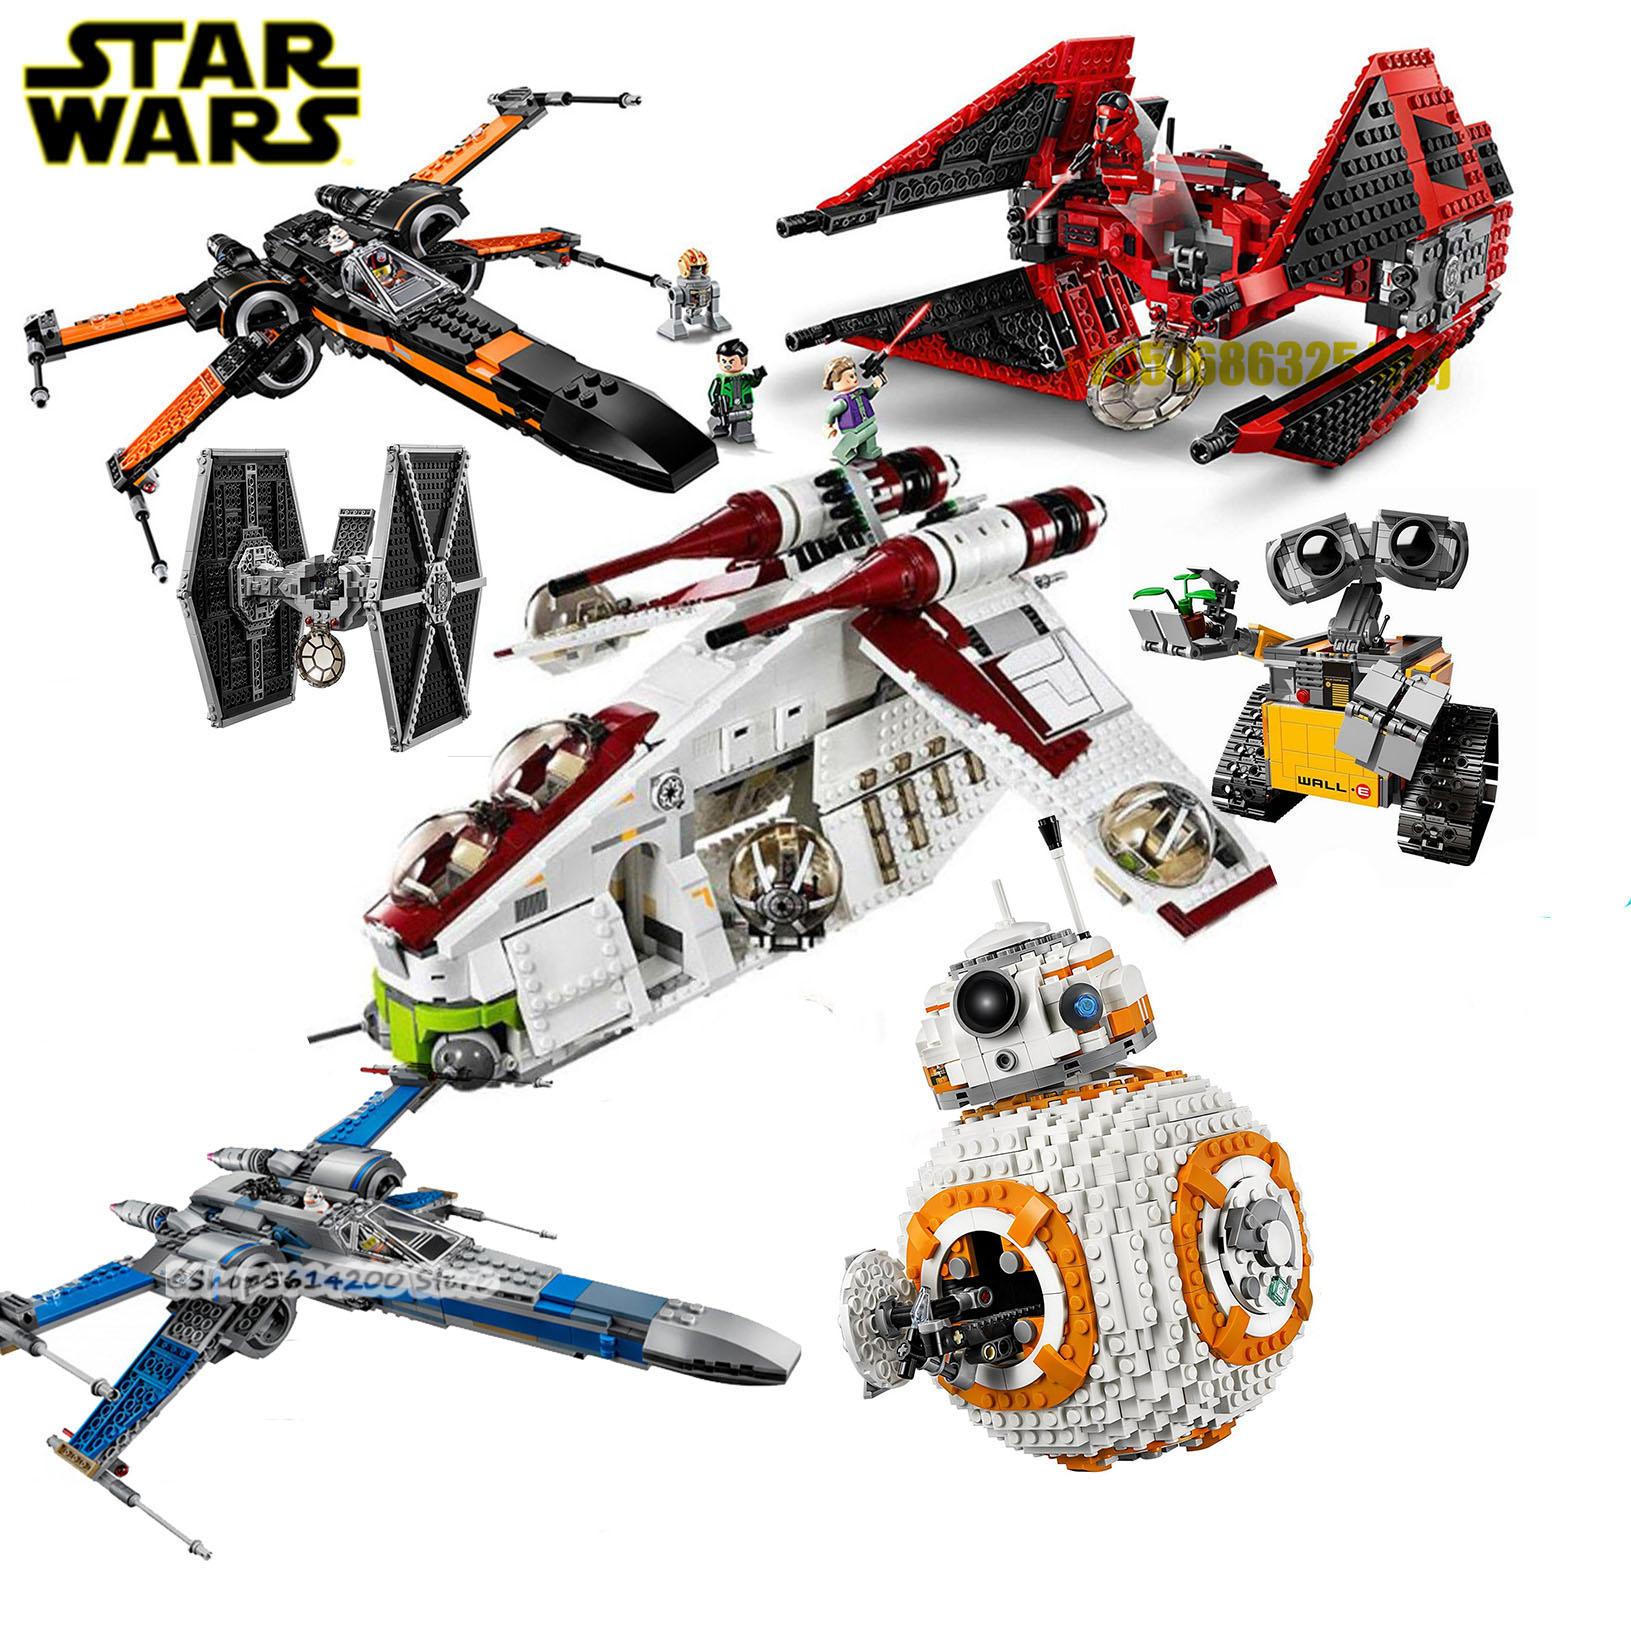 79211 IN Stock Compatible Lepining Star Wars Series Trade Federation MTT Building Blocks Bricks Toys 75251 75255